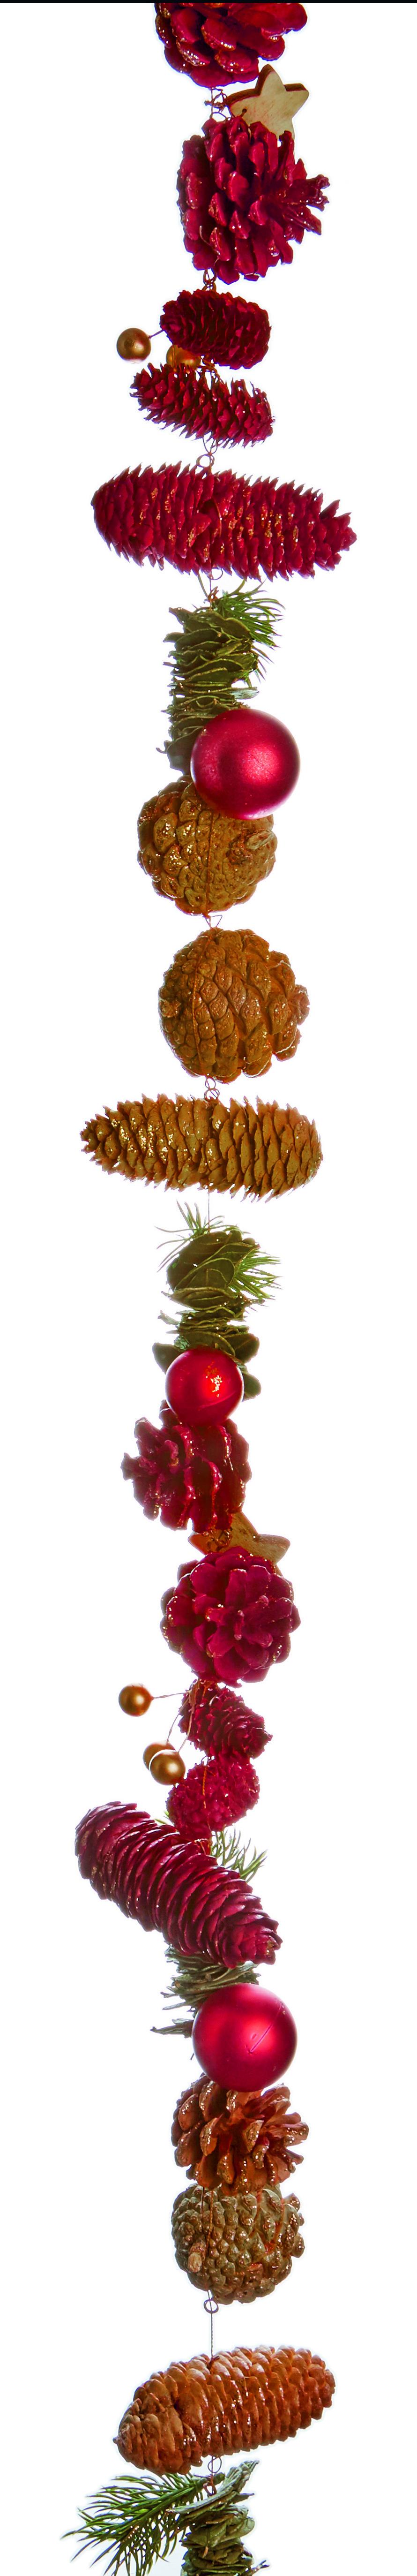 Premier 1.5m Natural Burgundy Cone w Glitter - Stars Garland